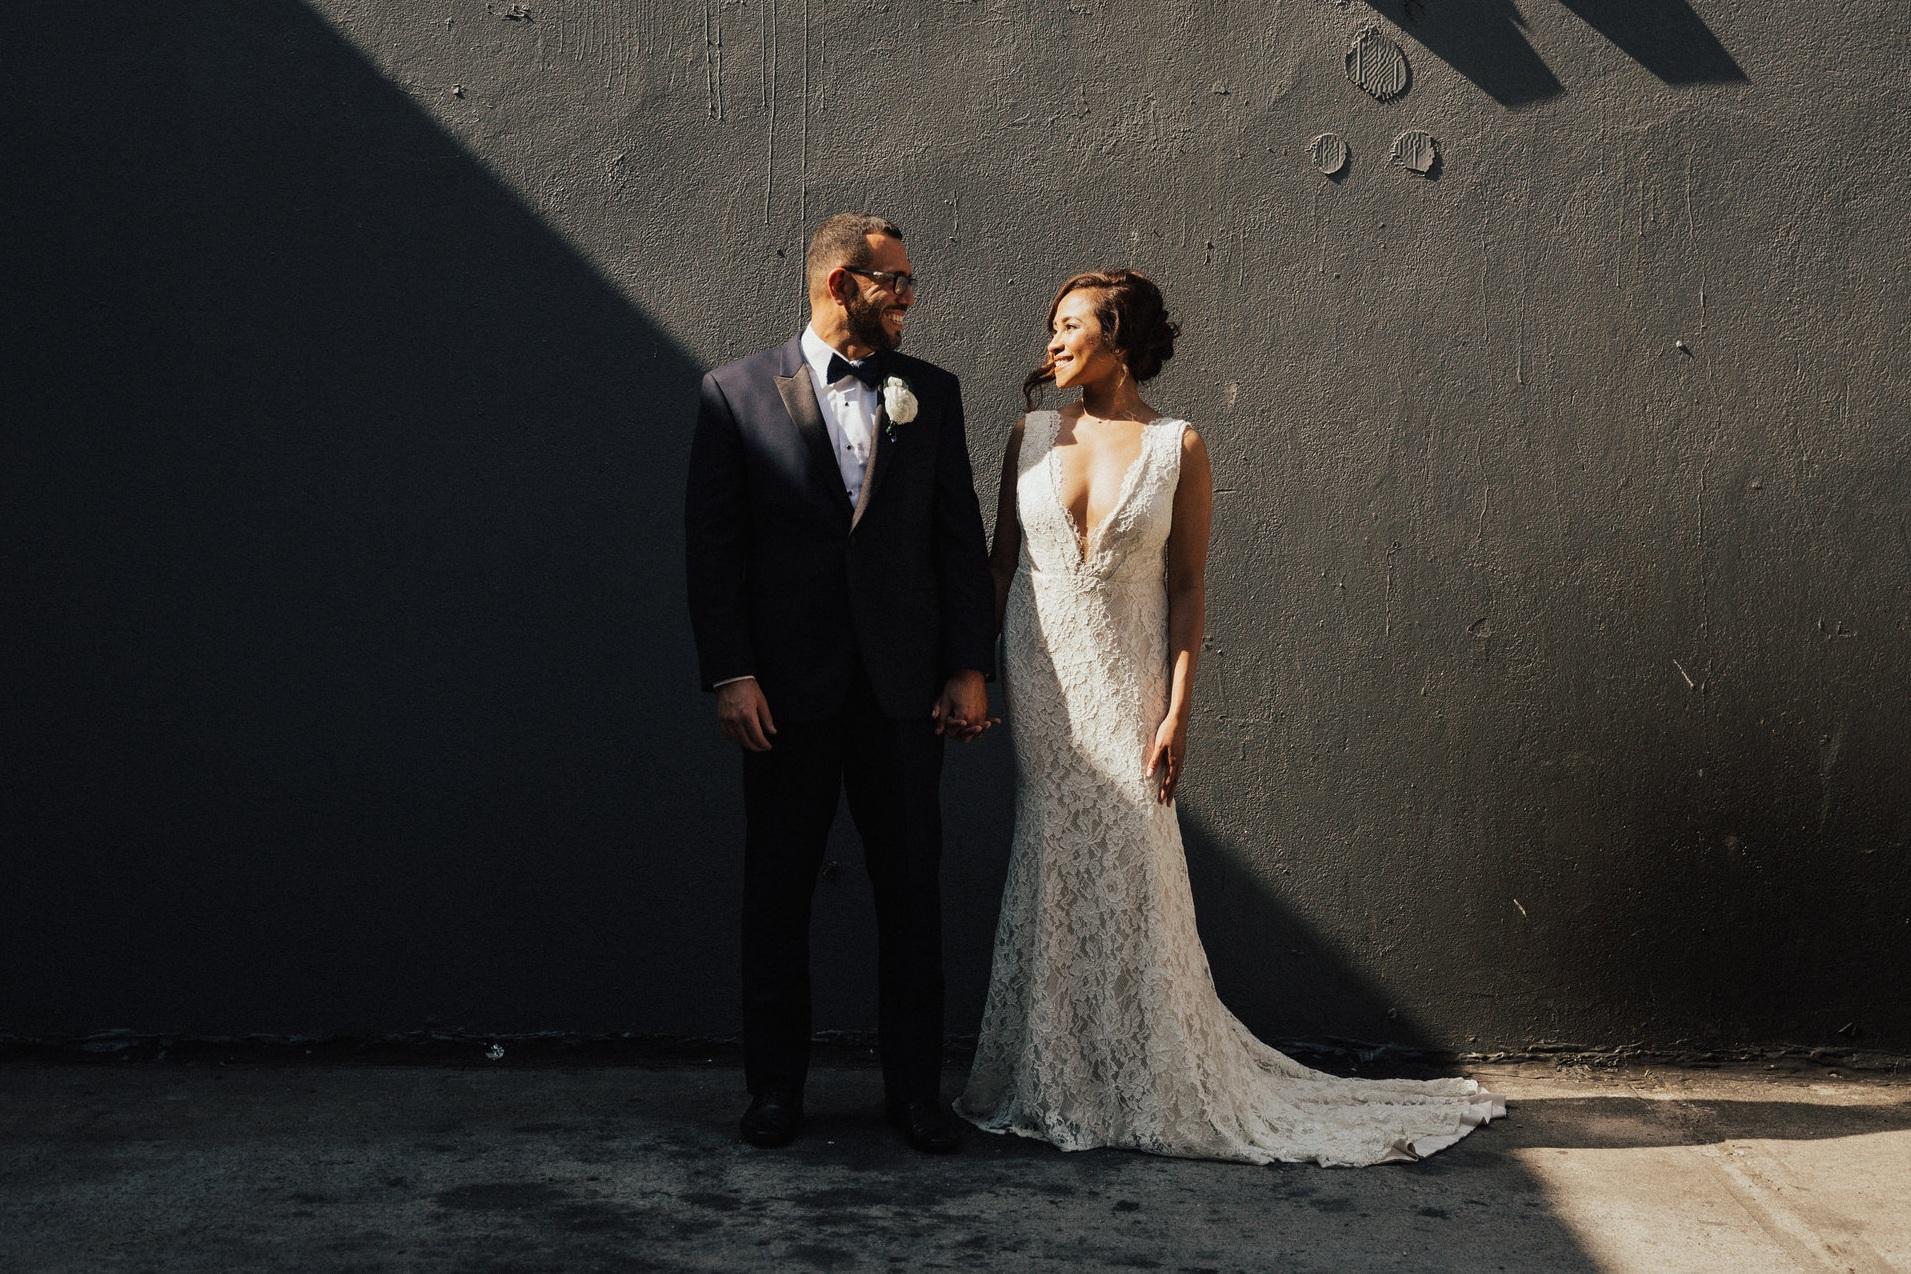 Keren + Dave - W Loft Wedding